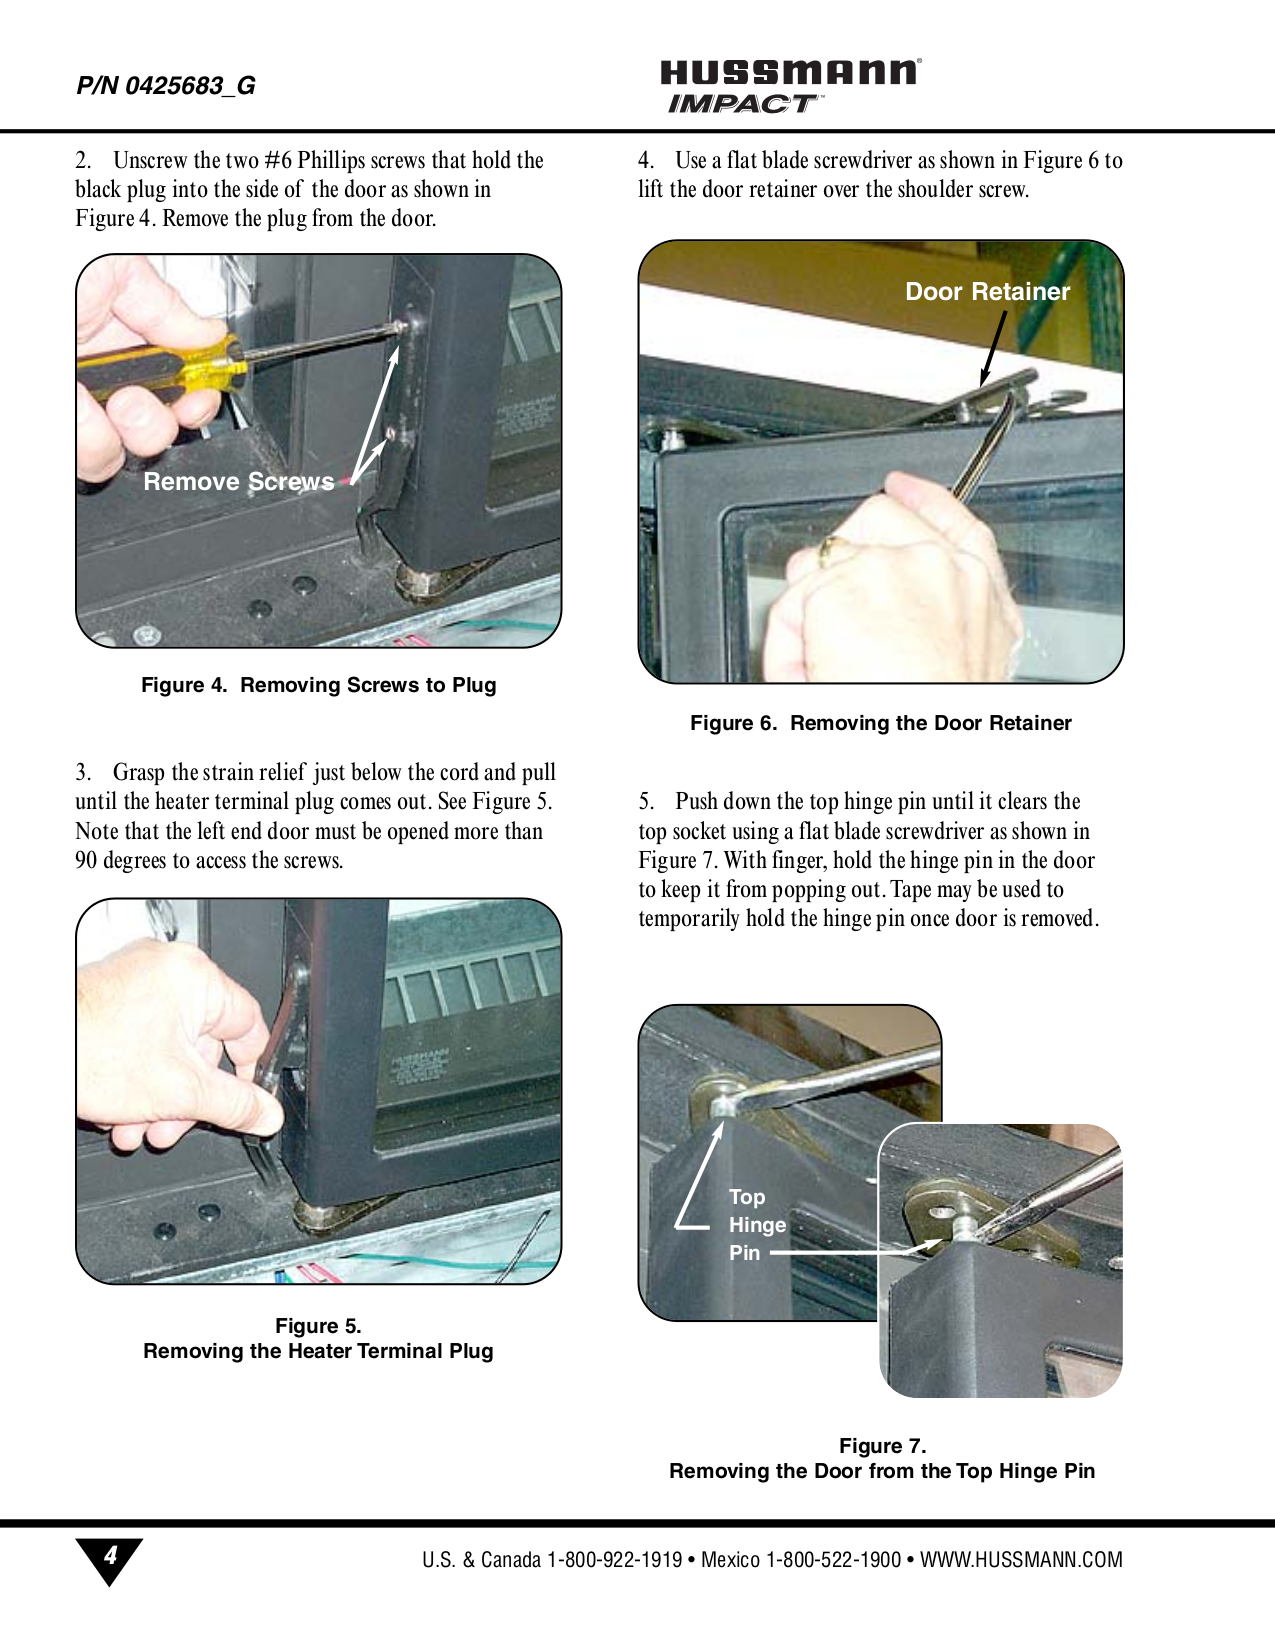 Hussmann RLN 5.pdf 7 hussmann rln 5 manual wiring diagrams wiring diagrams hussmann rl5 wiring diagram at readyjetset.co